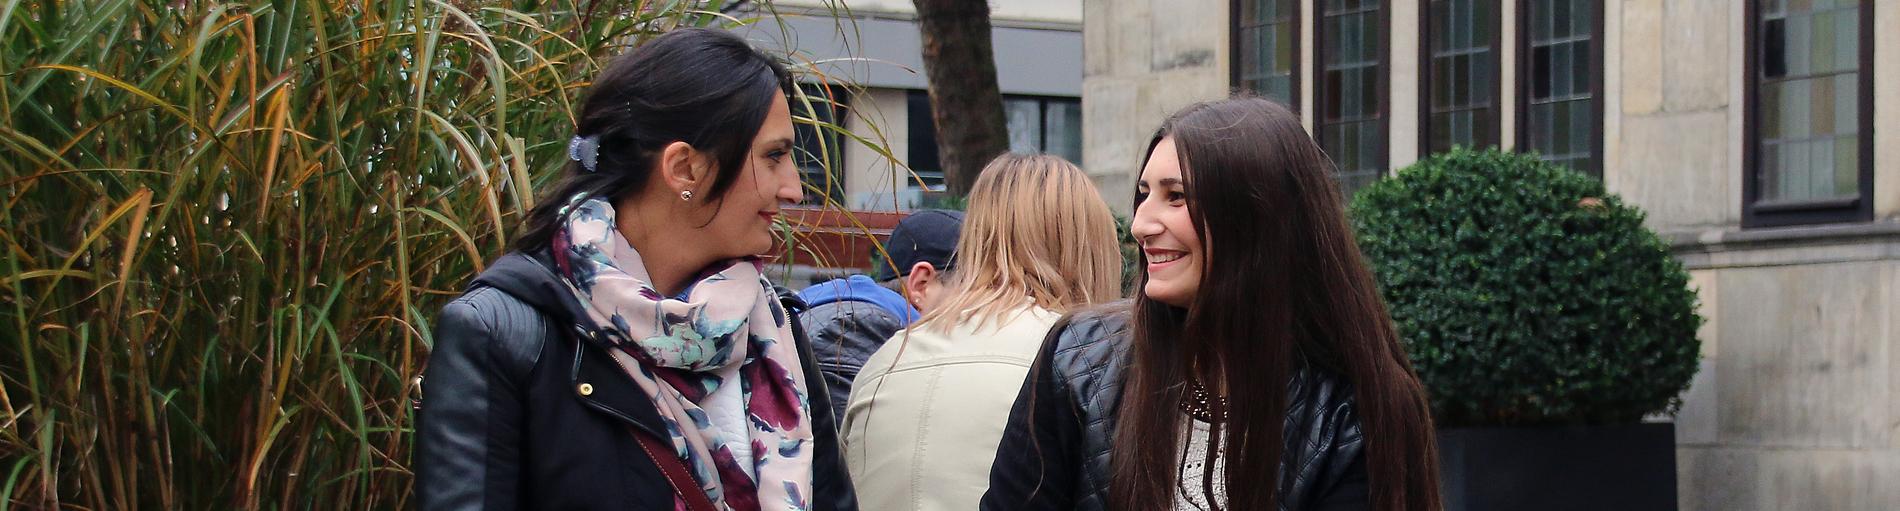 Zwei Frauen machen Shoppingpause am Ansgarikirchhof